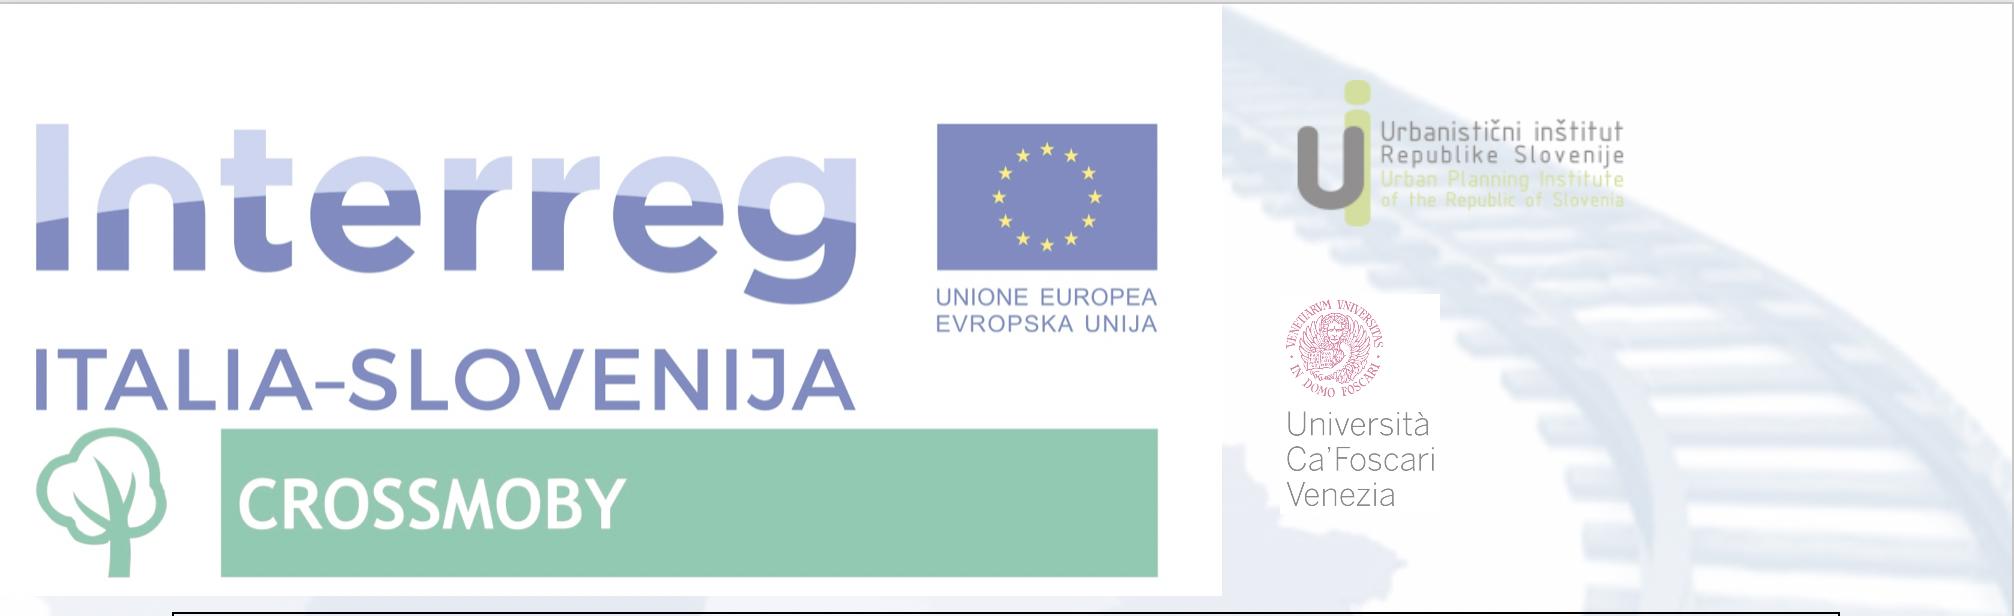 Crossmoby project - Interreg V-A Italija-Slovenija 2014-2020